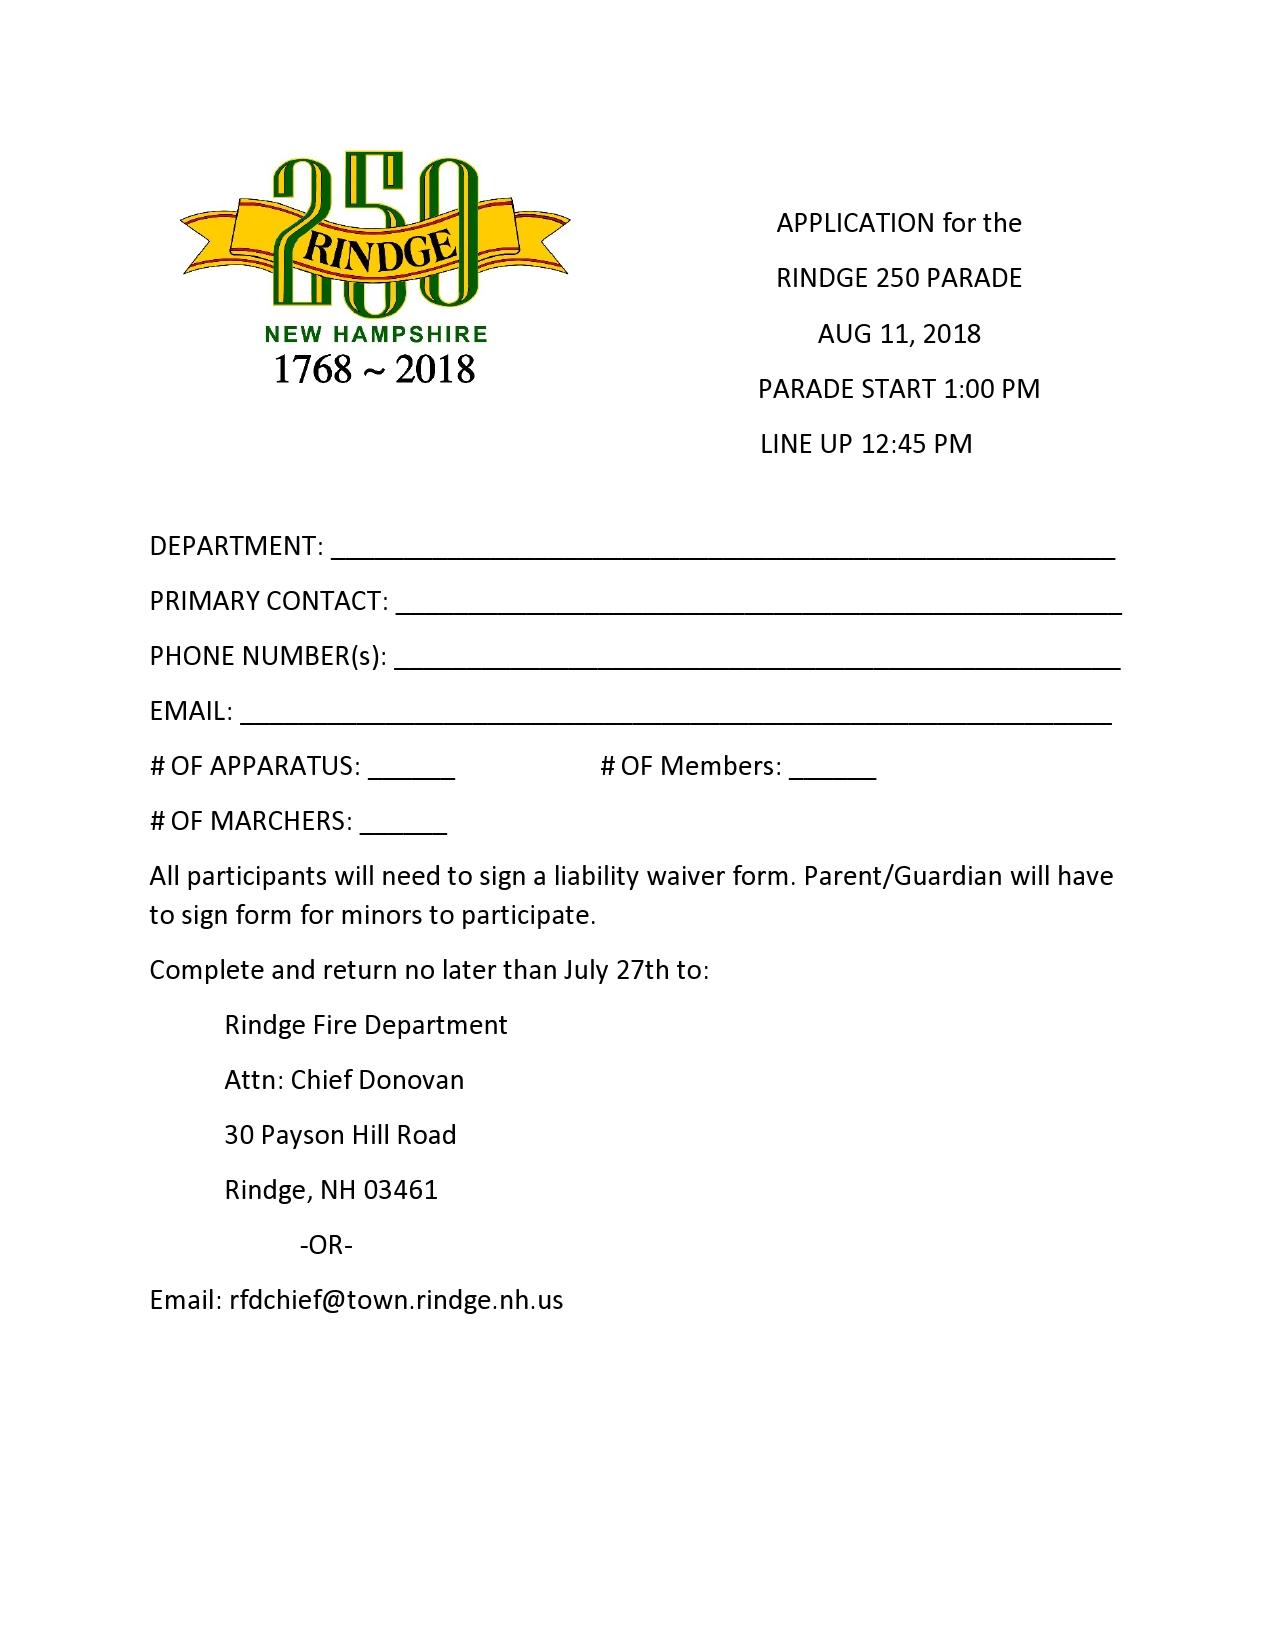 FD APPLCIATION for Parade (1)-page0001.jpg